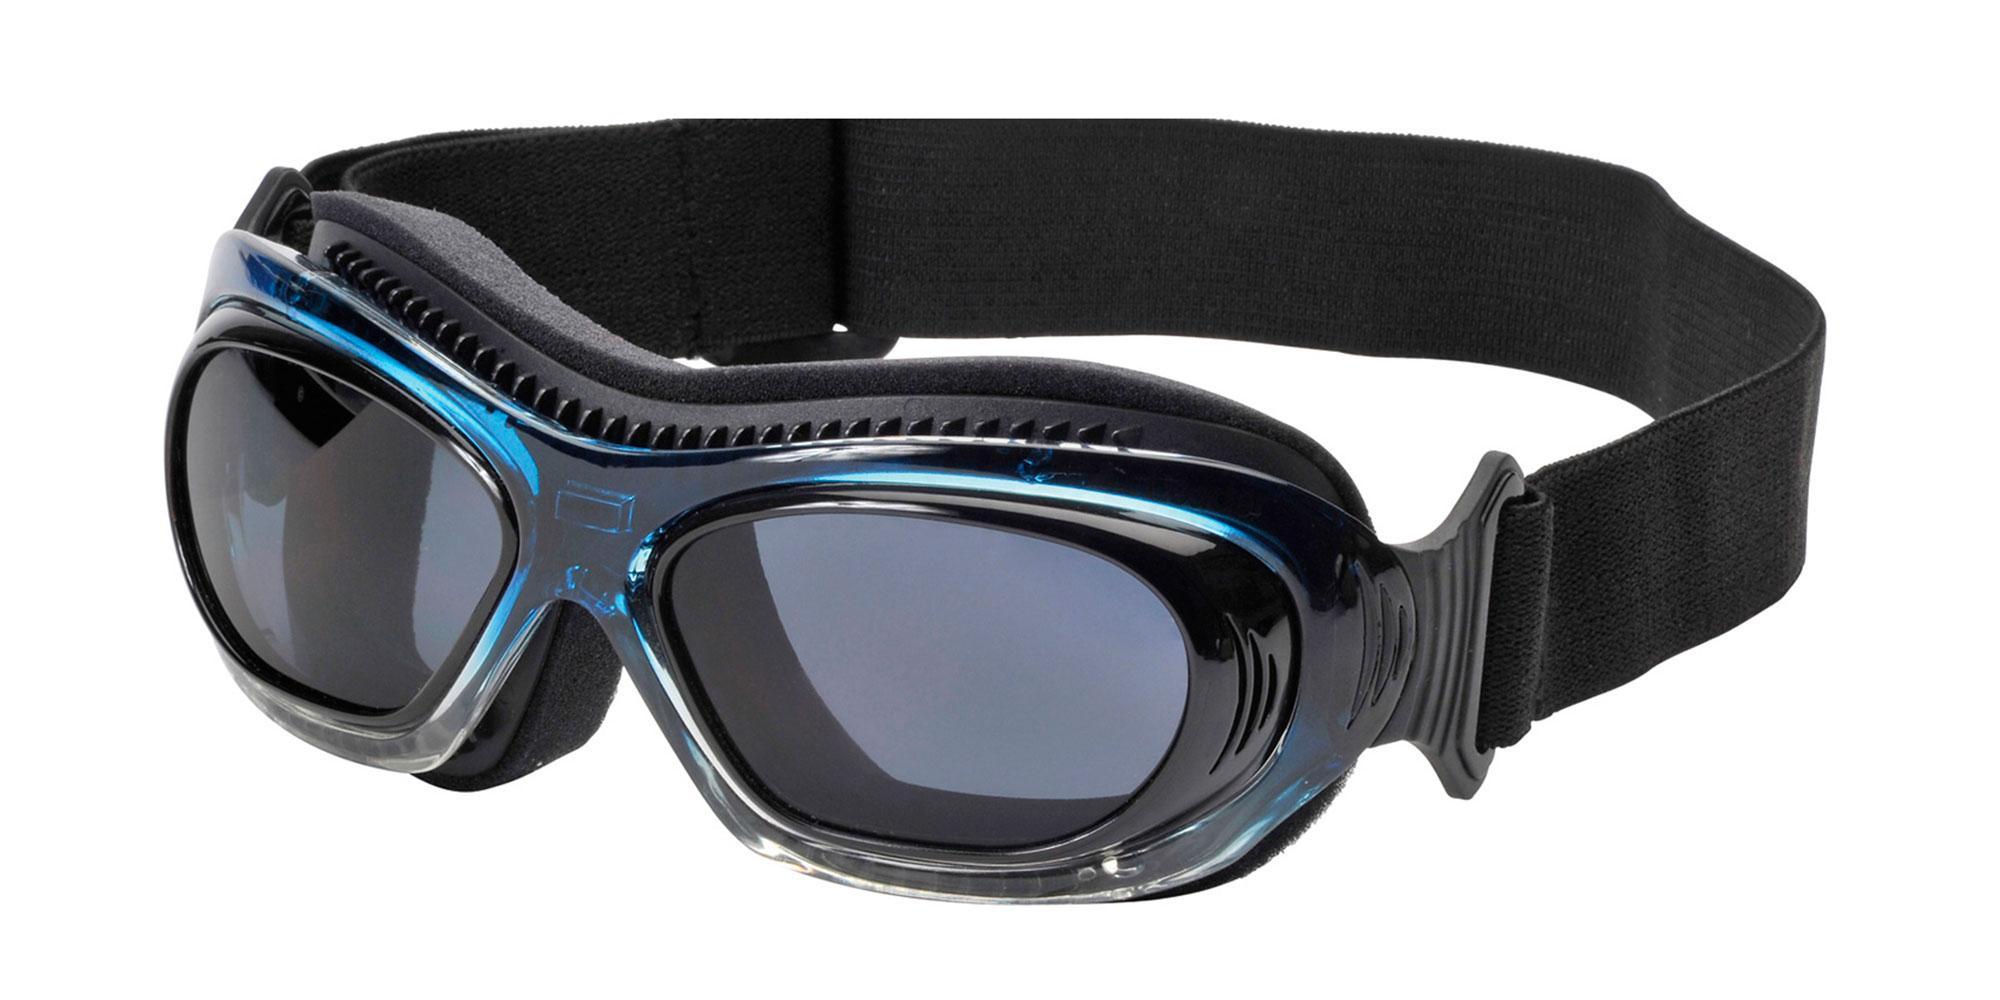 Blue Bling Boarding Goggle Goggles, Sports Eyewear